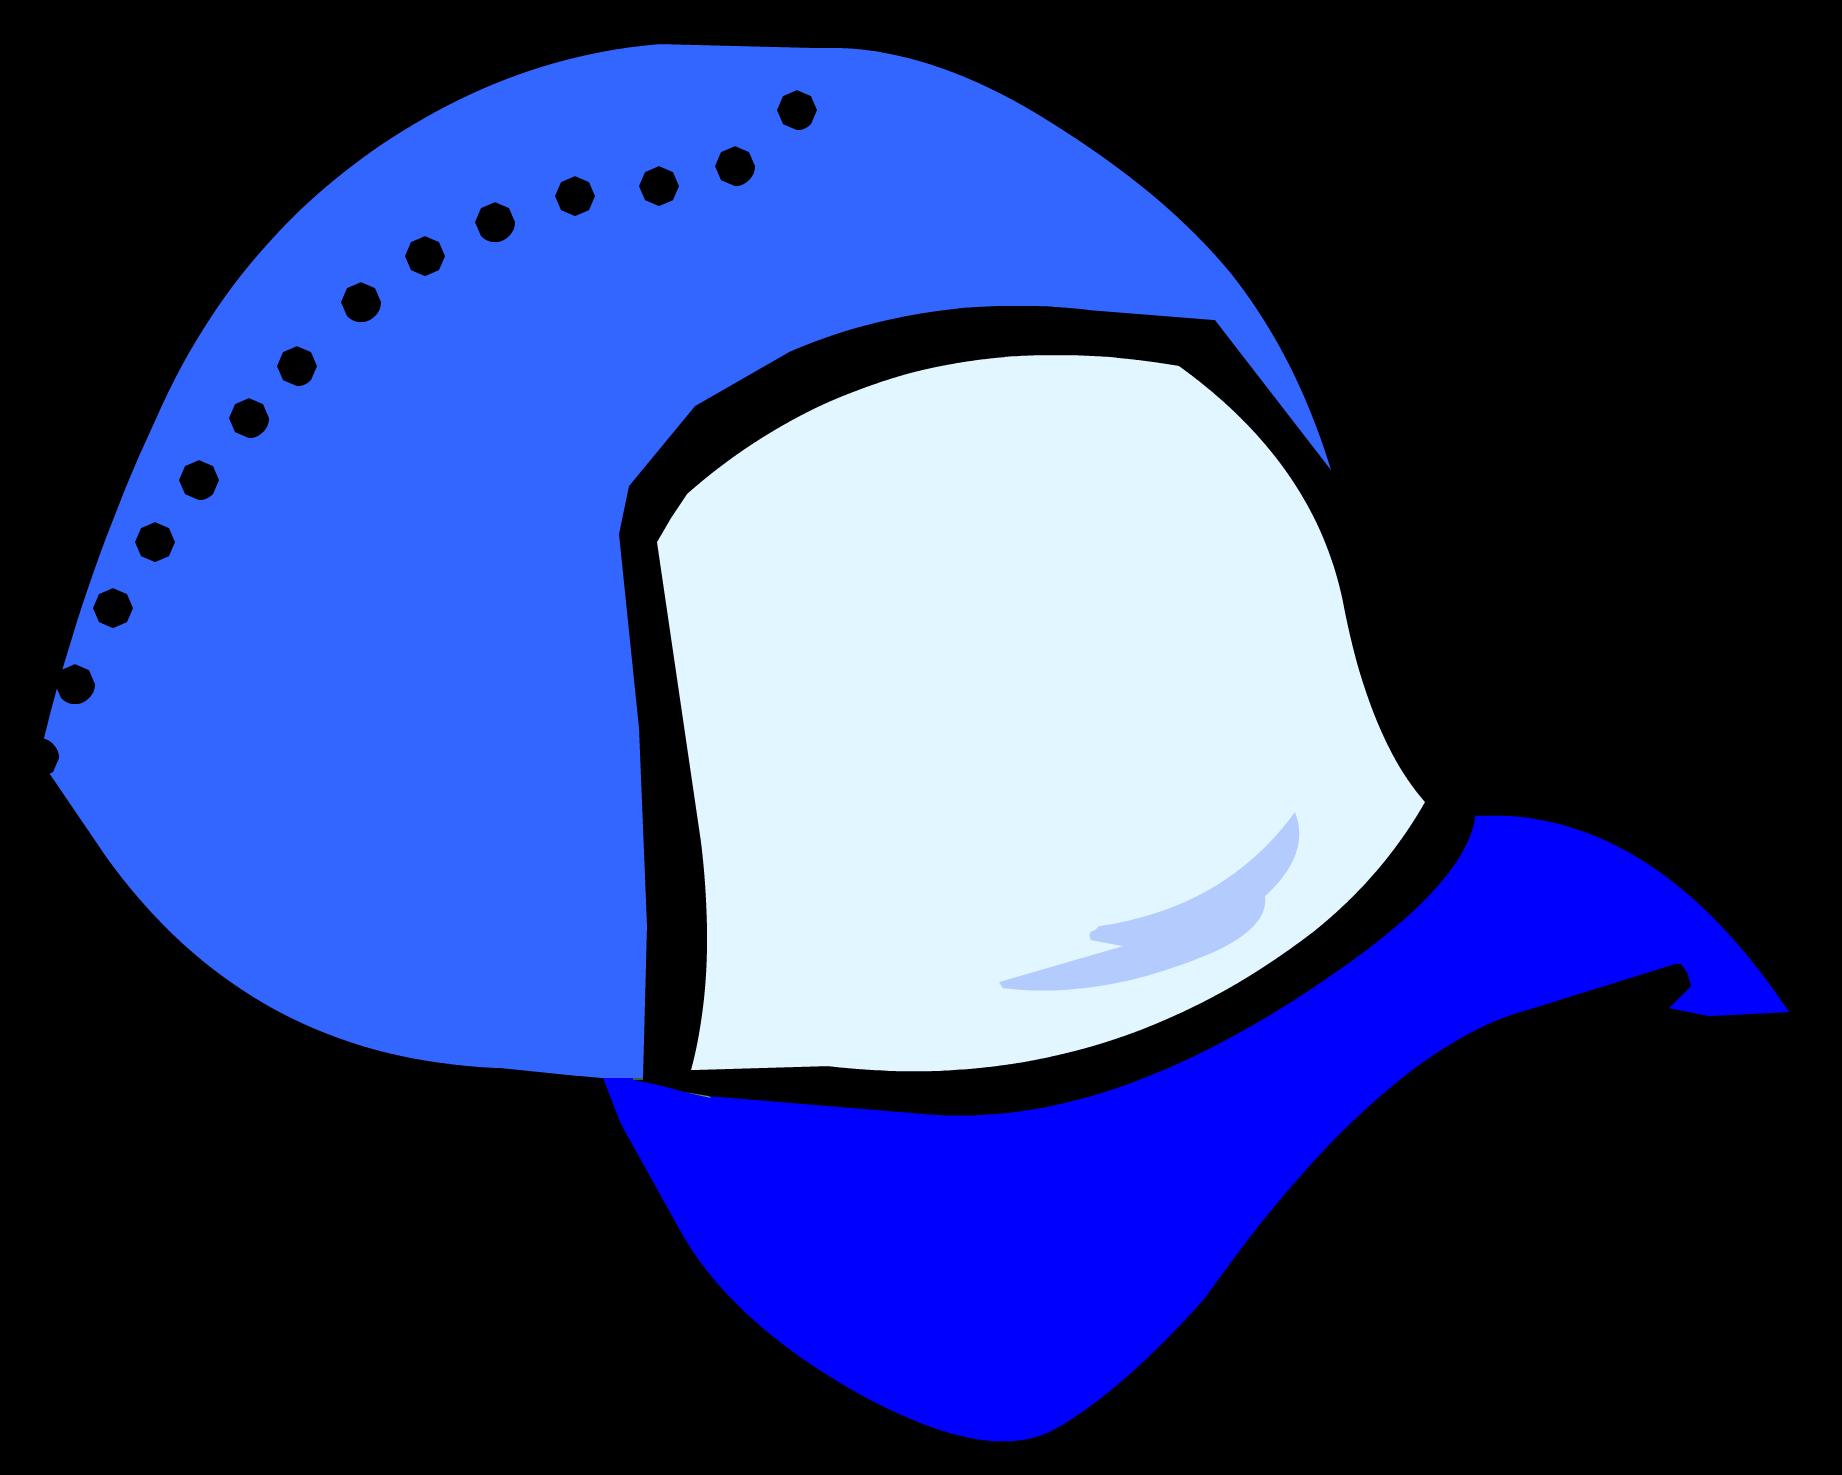 Clipart blue baseball cap backwards royalty free Blue Ball Cap   Club Penguin Wiki   FANDOM powered by Wikia royalty free